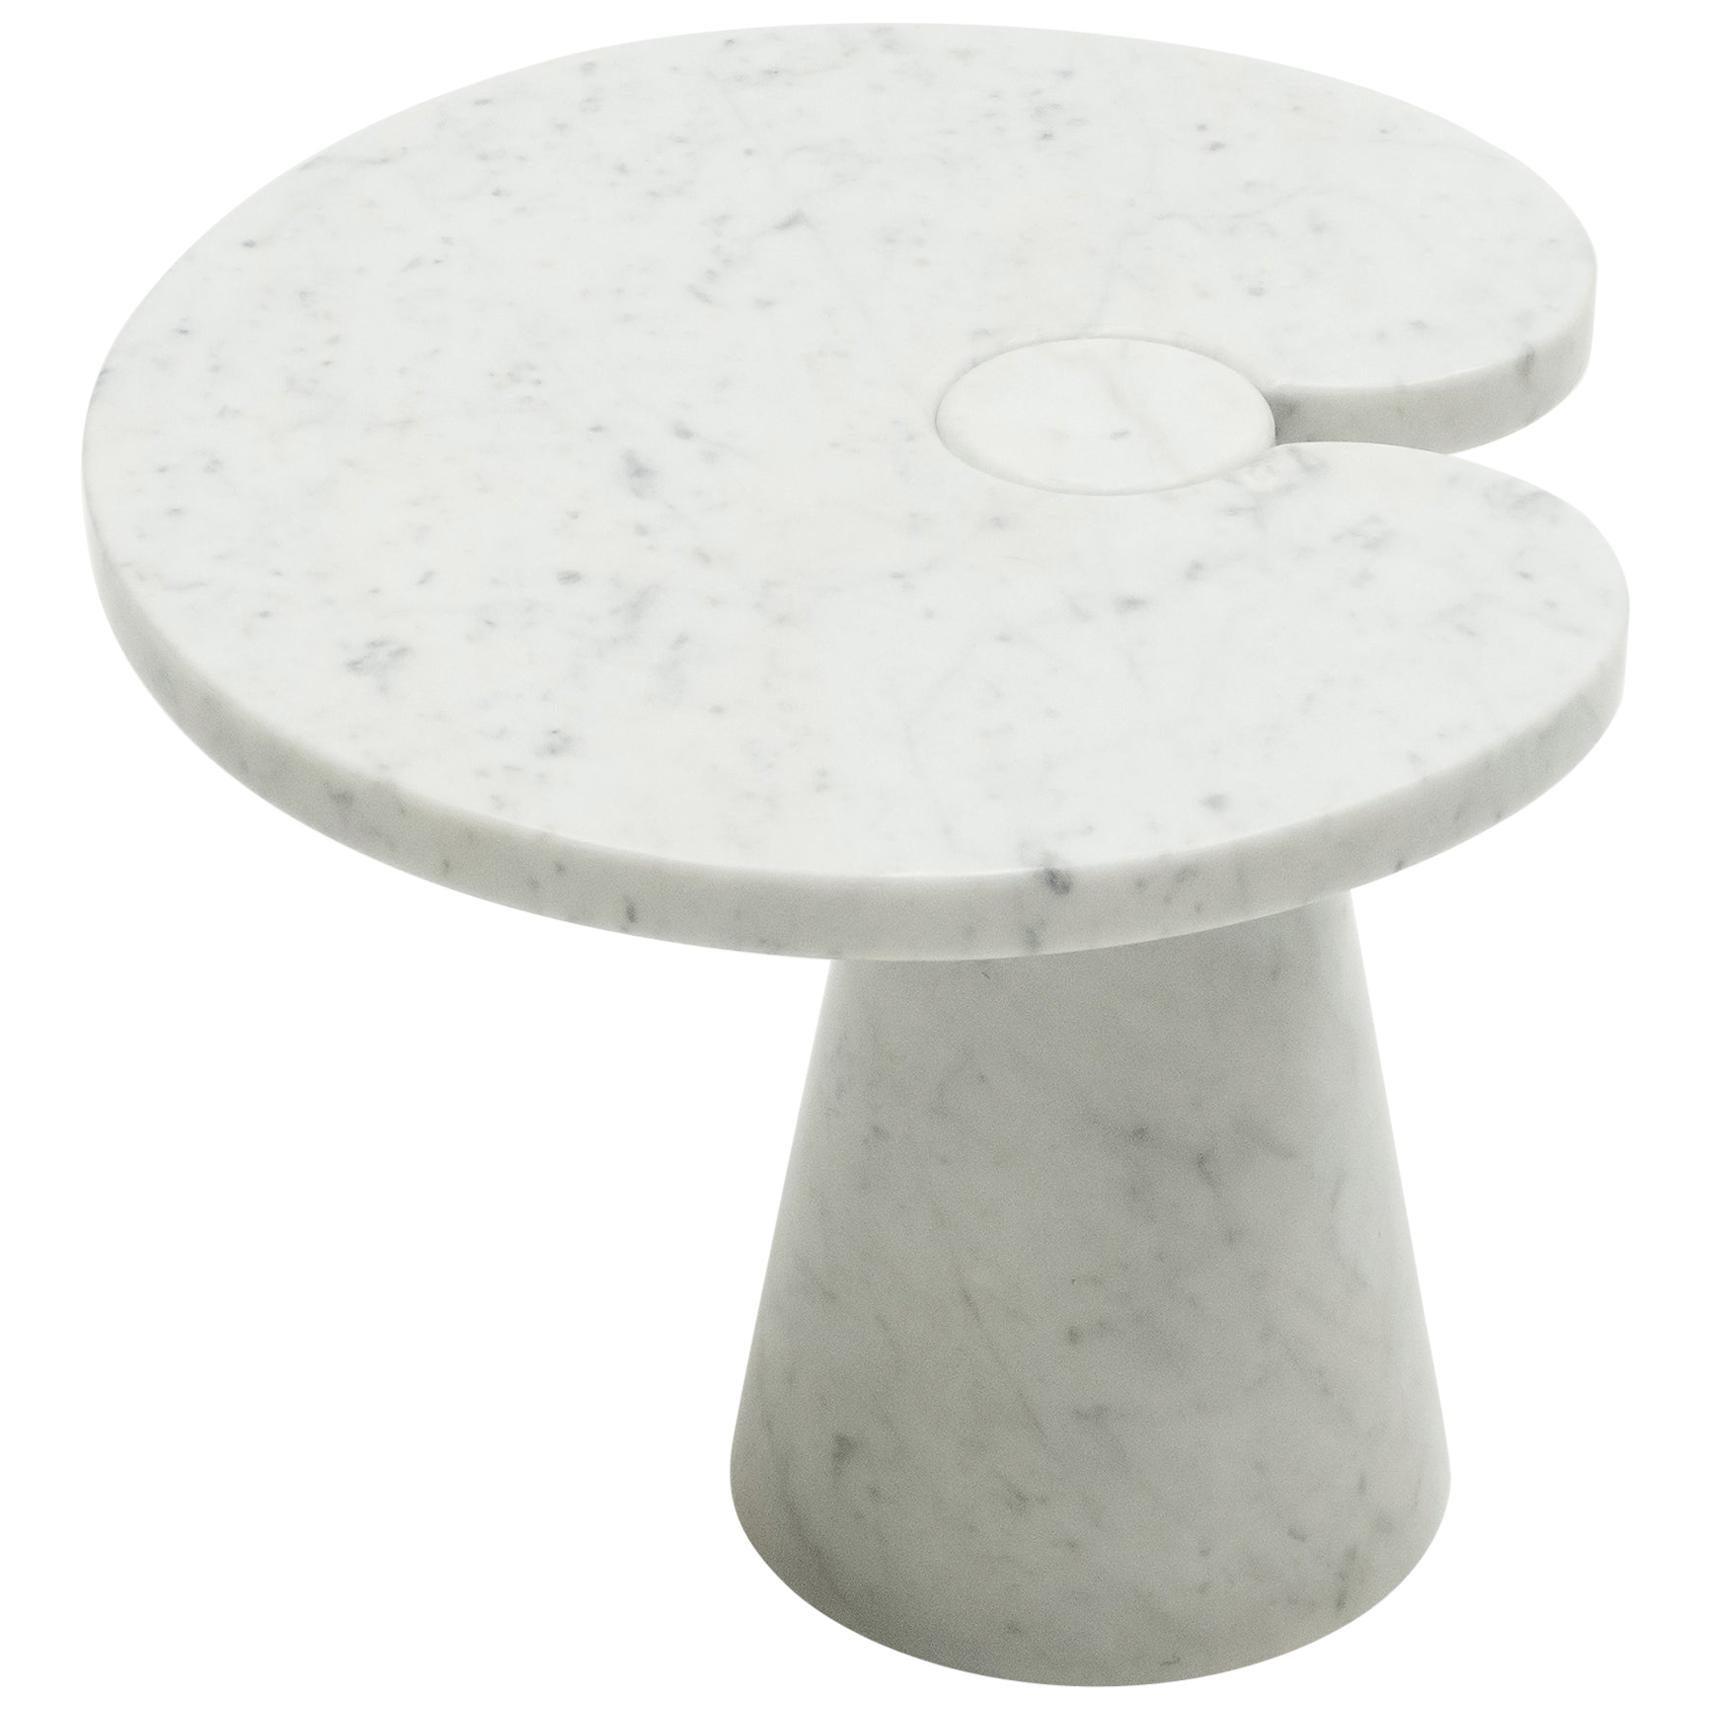 Original Angelo Mangiarotti Marble Side Table Eros Series, Italy, 1970s